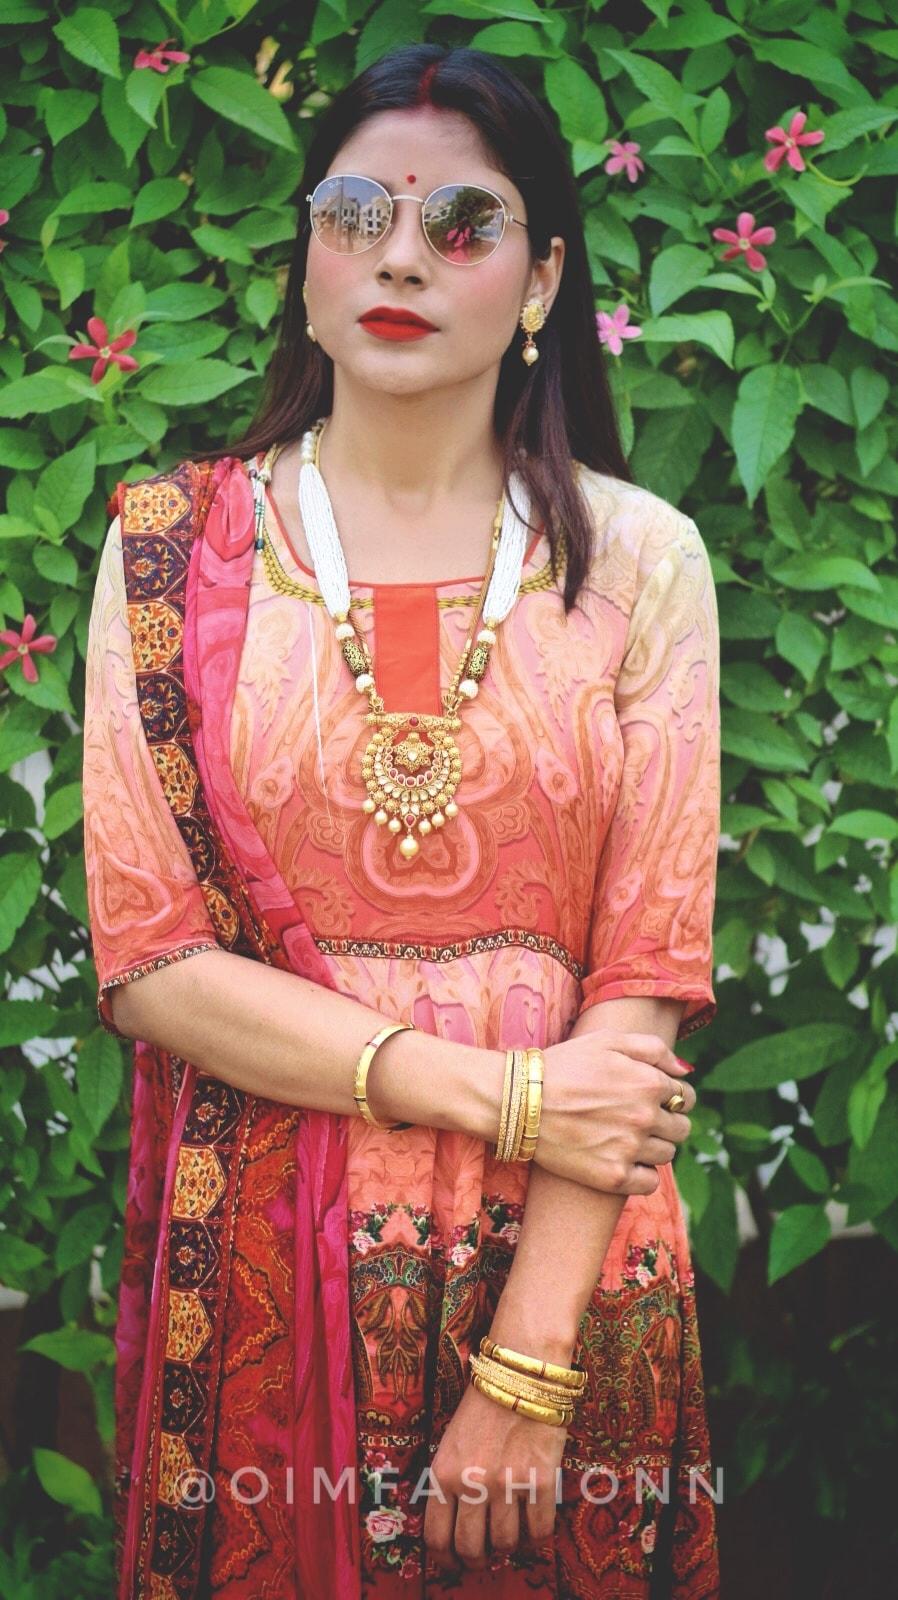 Sabyasachi Mukherjee, Designer suits,Indian Fashion Bloggers , Anarkali Suits, Indian Jewellery, Ritu Pandit, Fashion Bloggers Mumbai, Wishalley.com